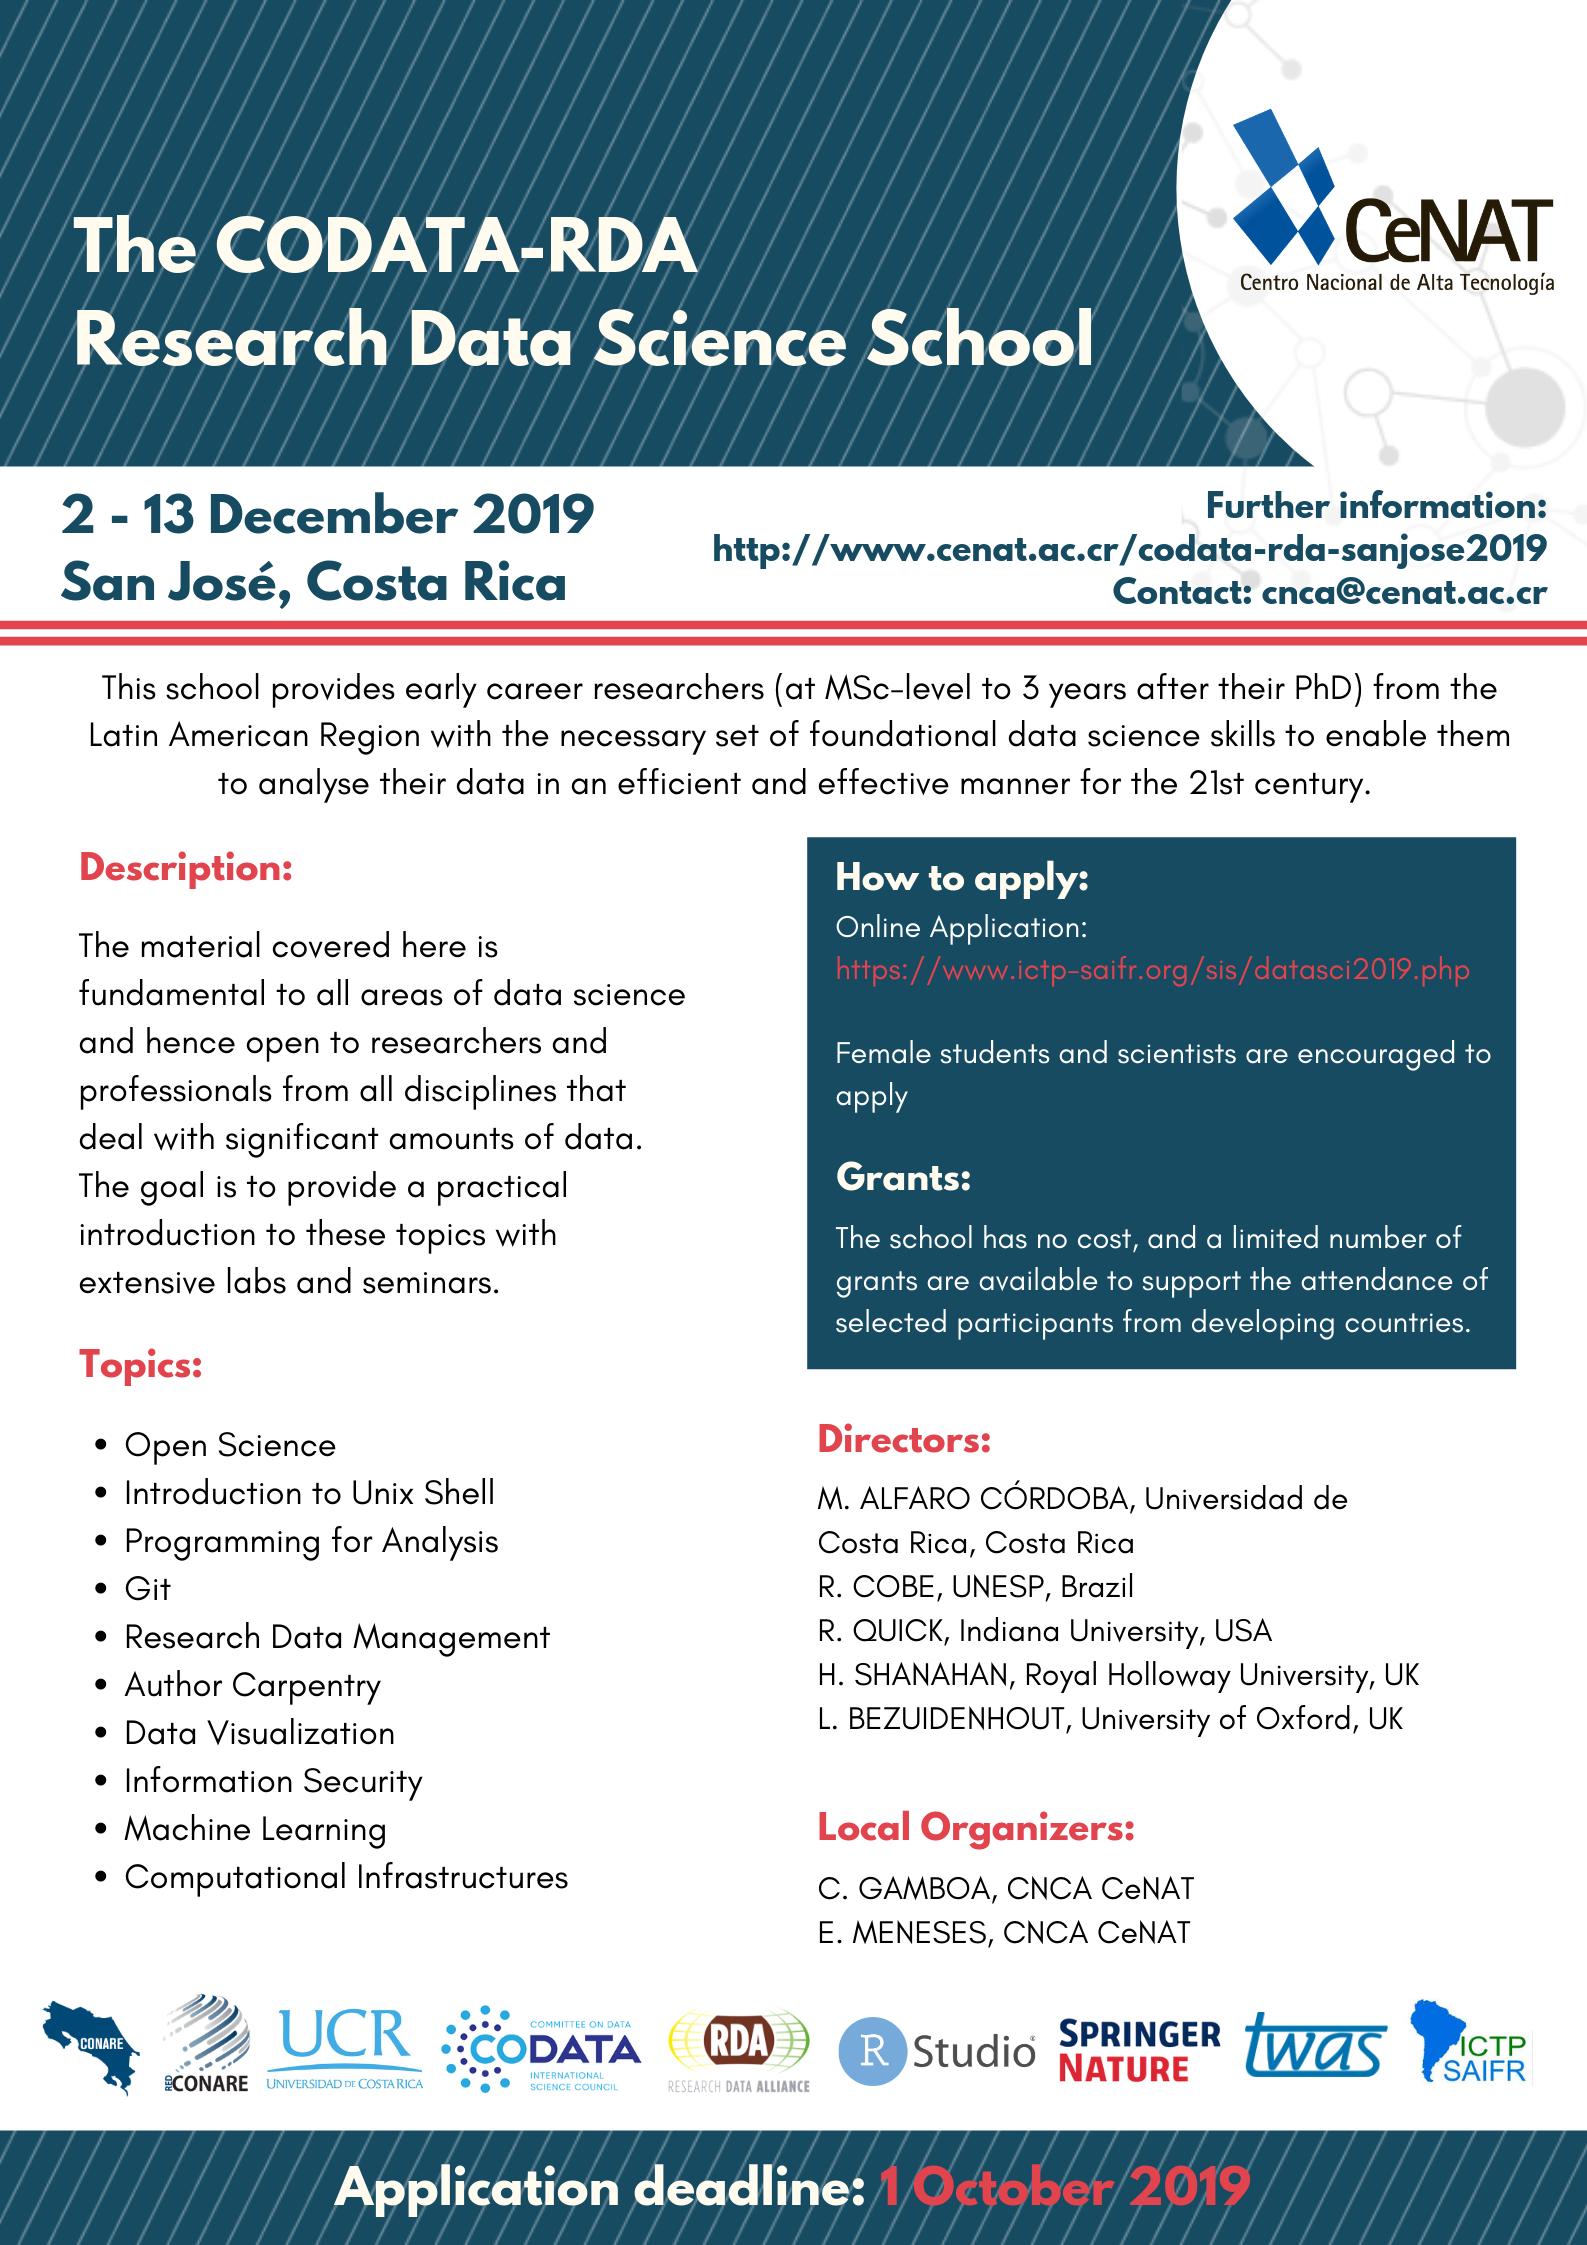 CODATA-RDA School of Research Data Science at San José de Costa Rica